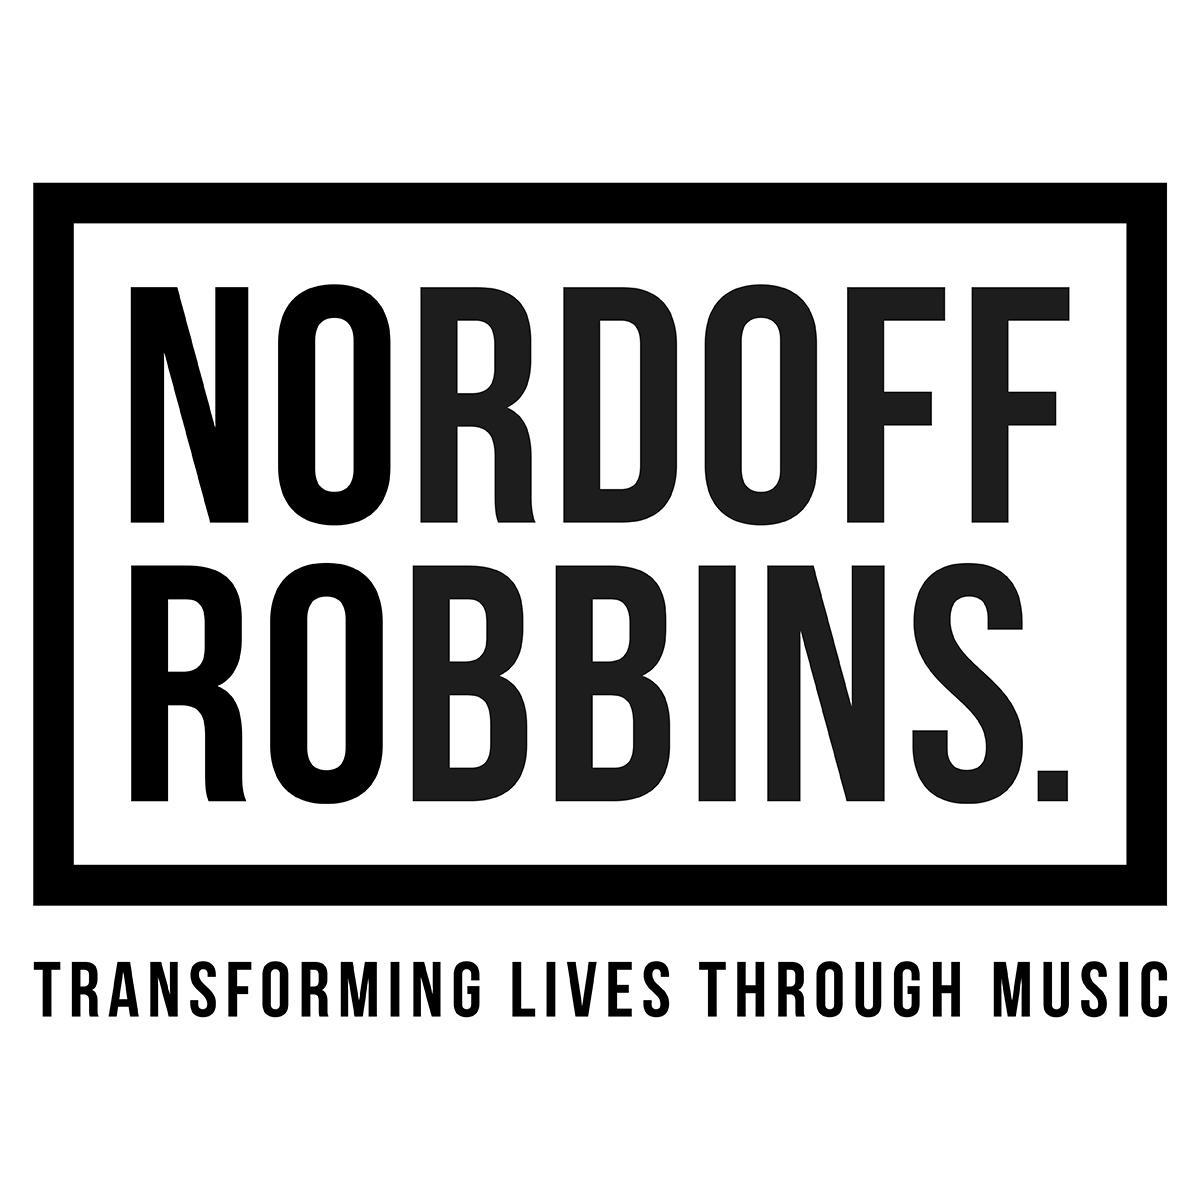 Nordoff Robbins.jpeg